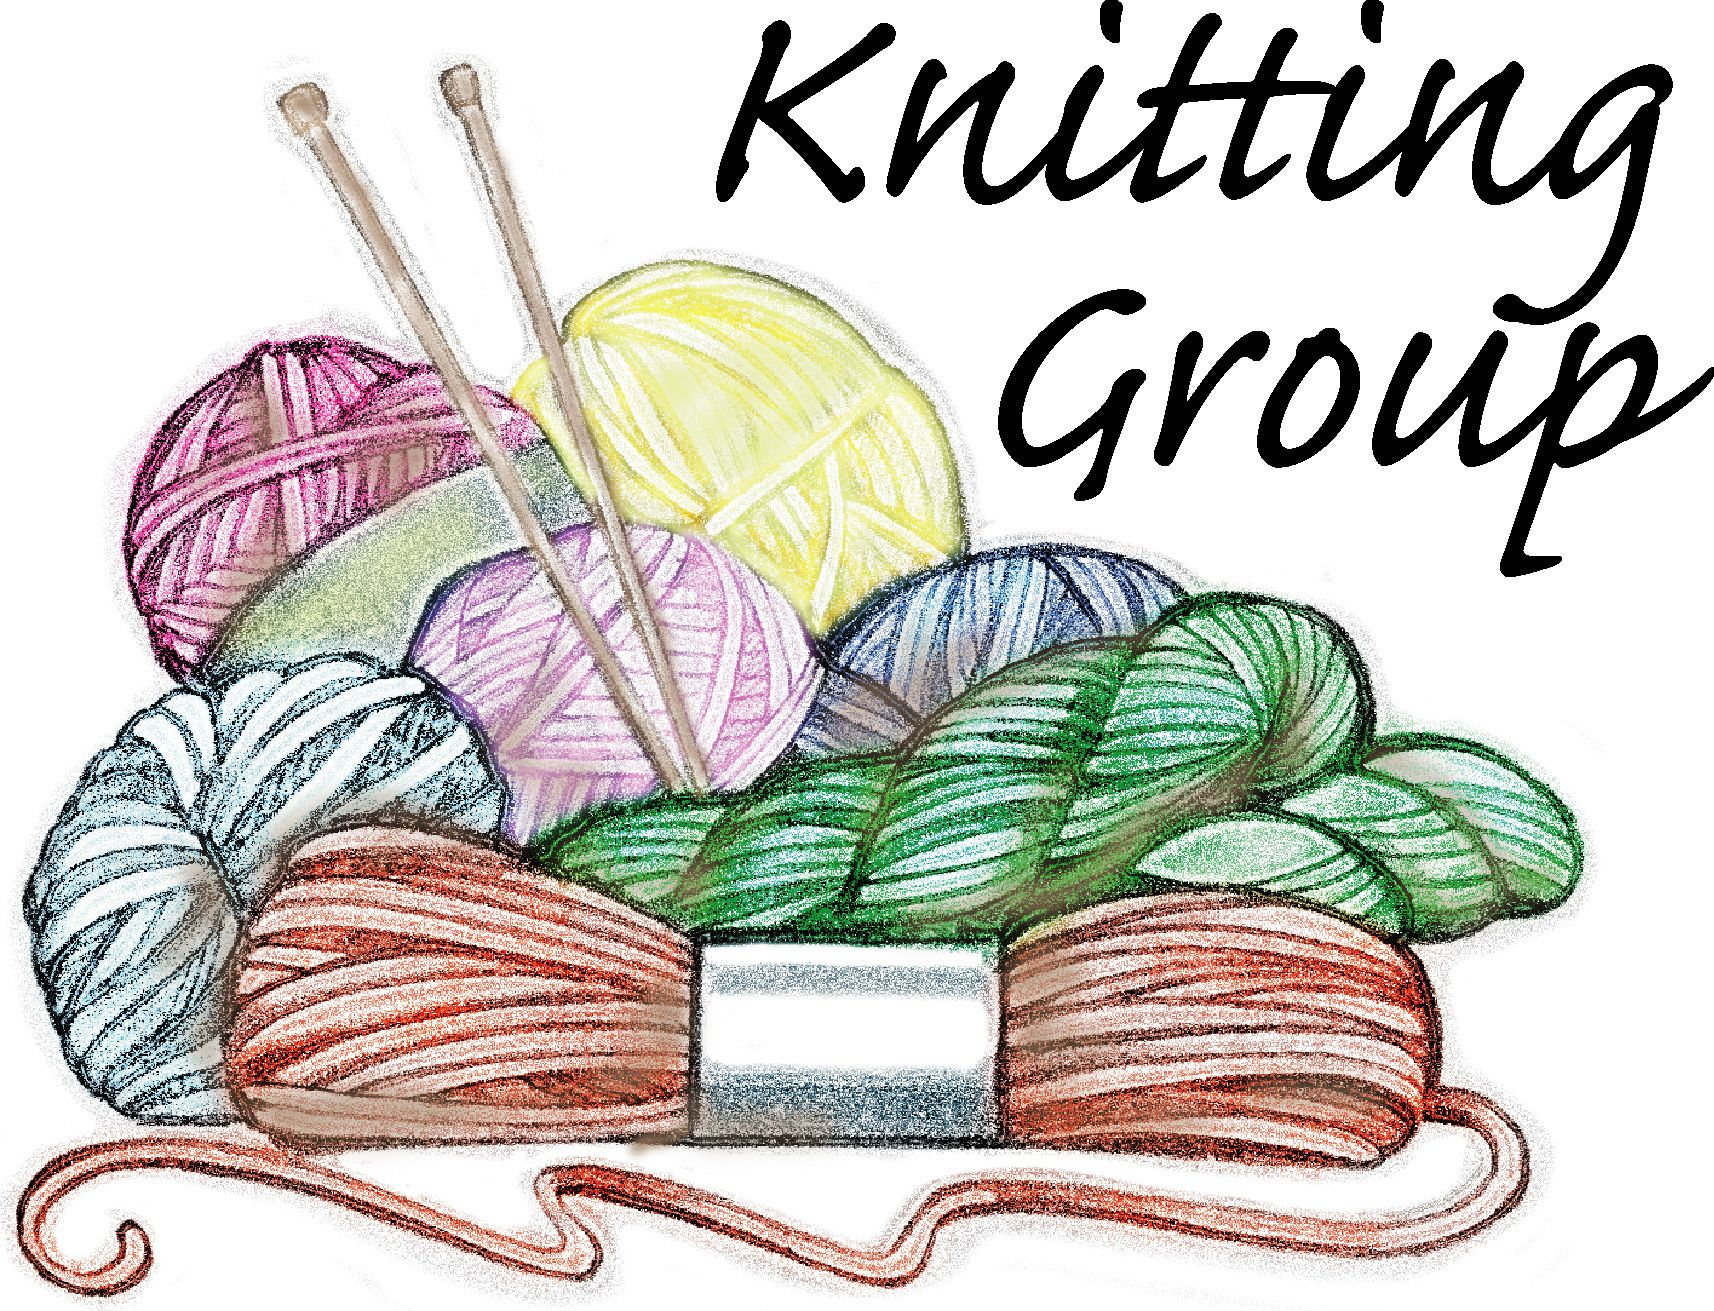 Knitting Images Free Clip Art : Clip art women knitting or crocheting the